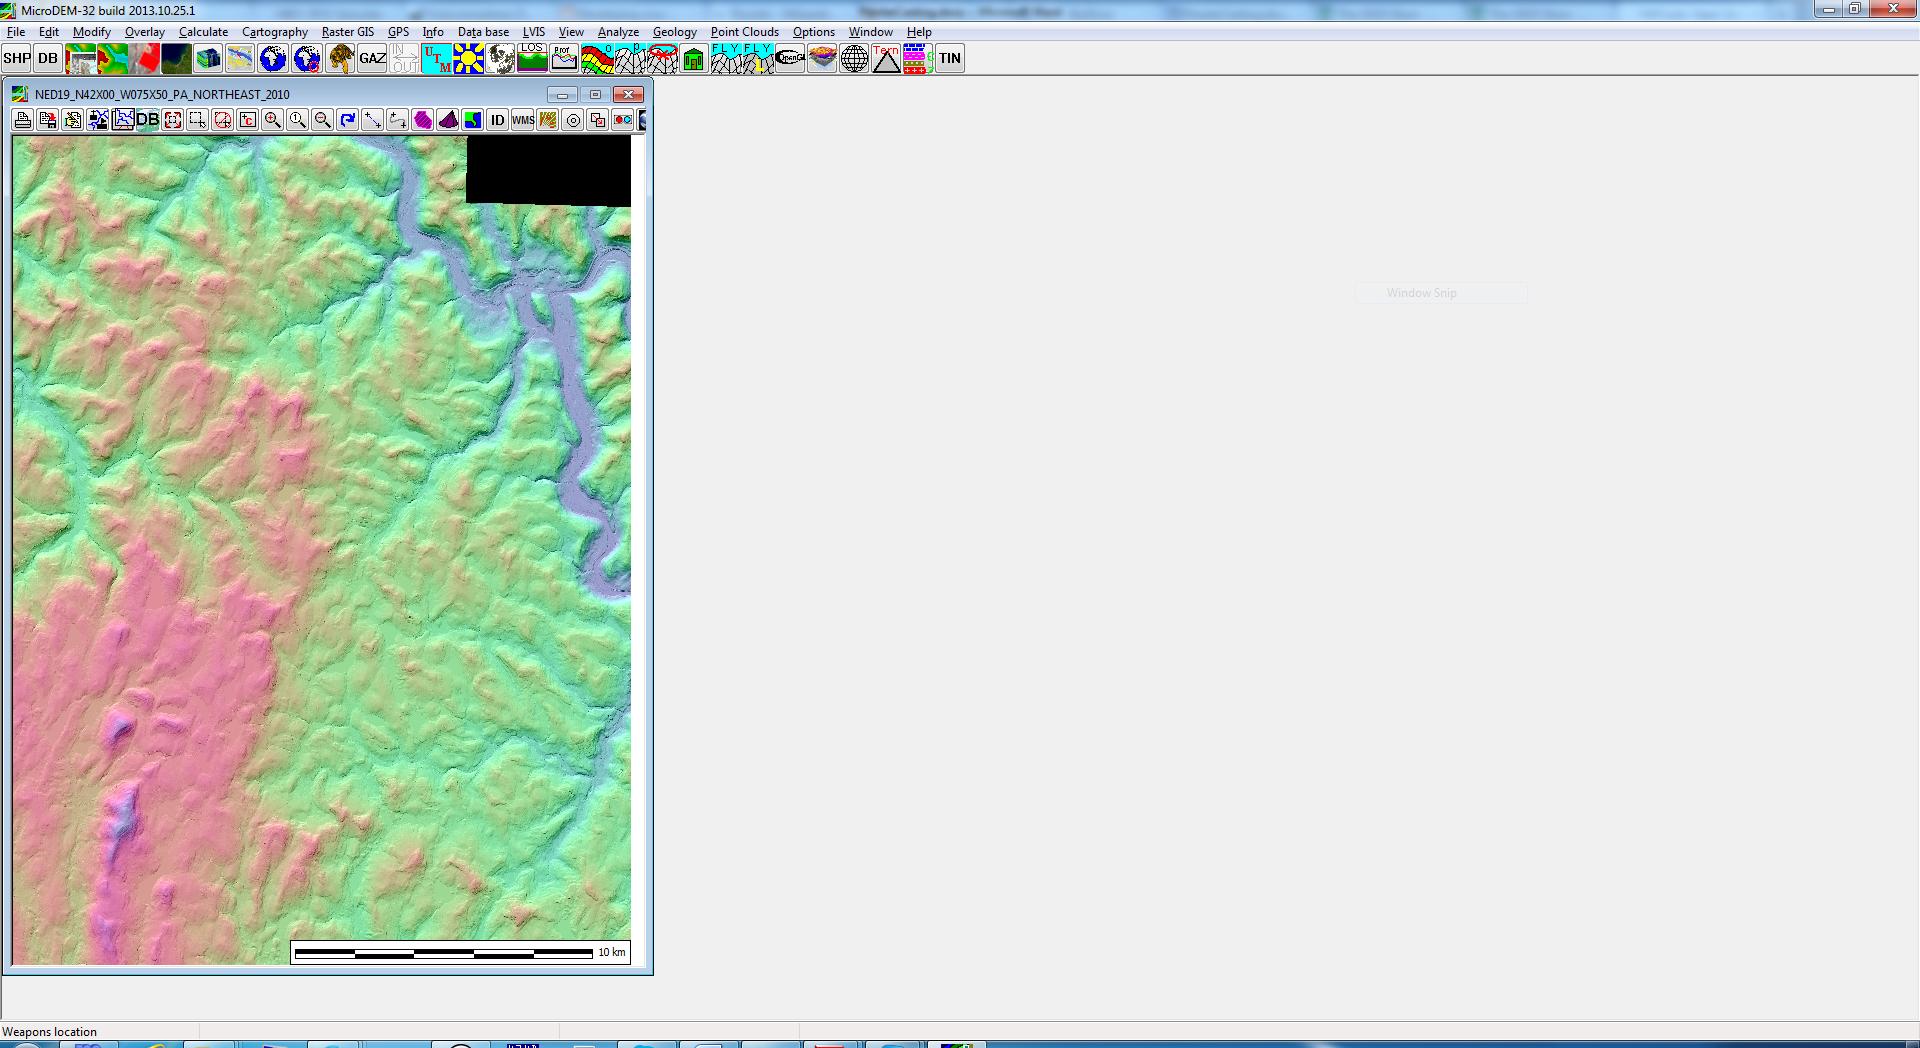 ReidB net -- Creating STLs from USGS datasets